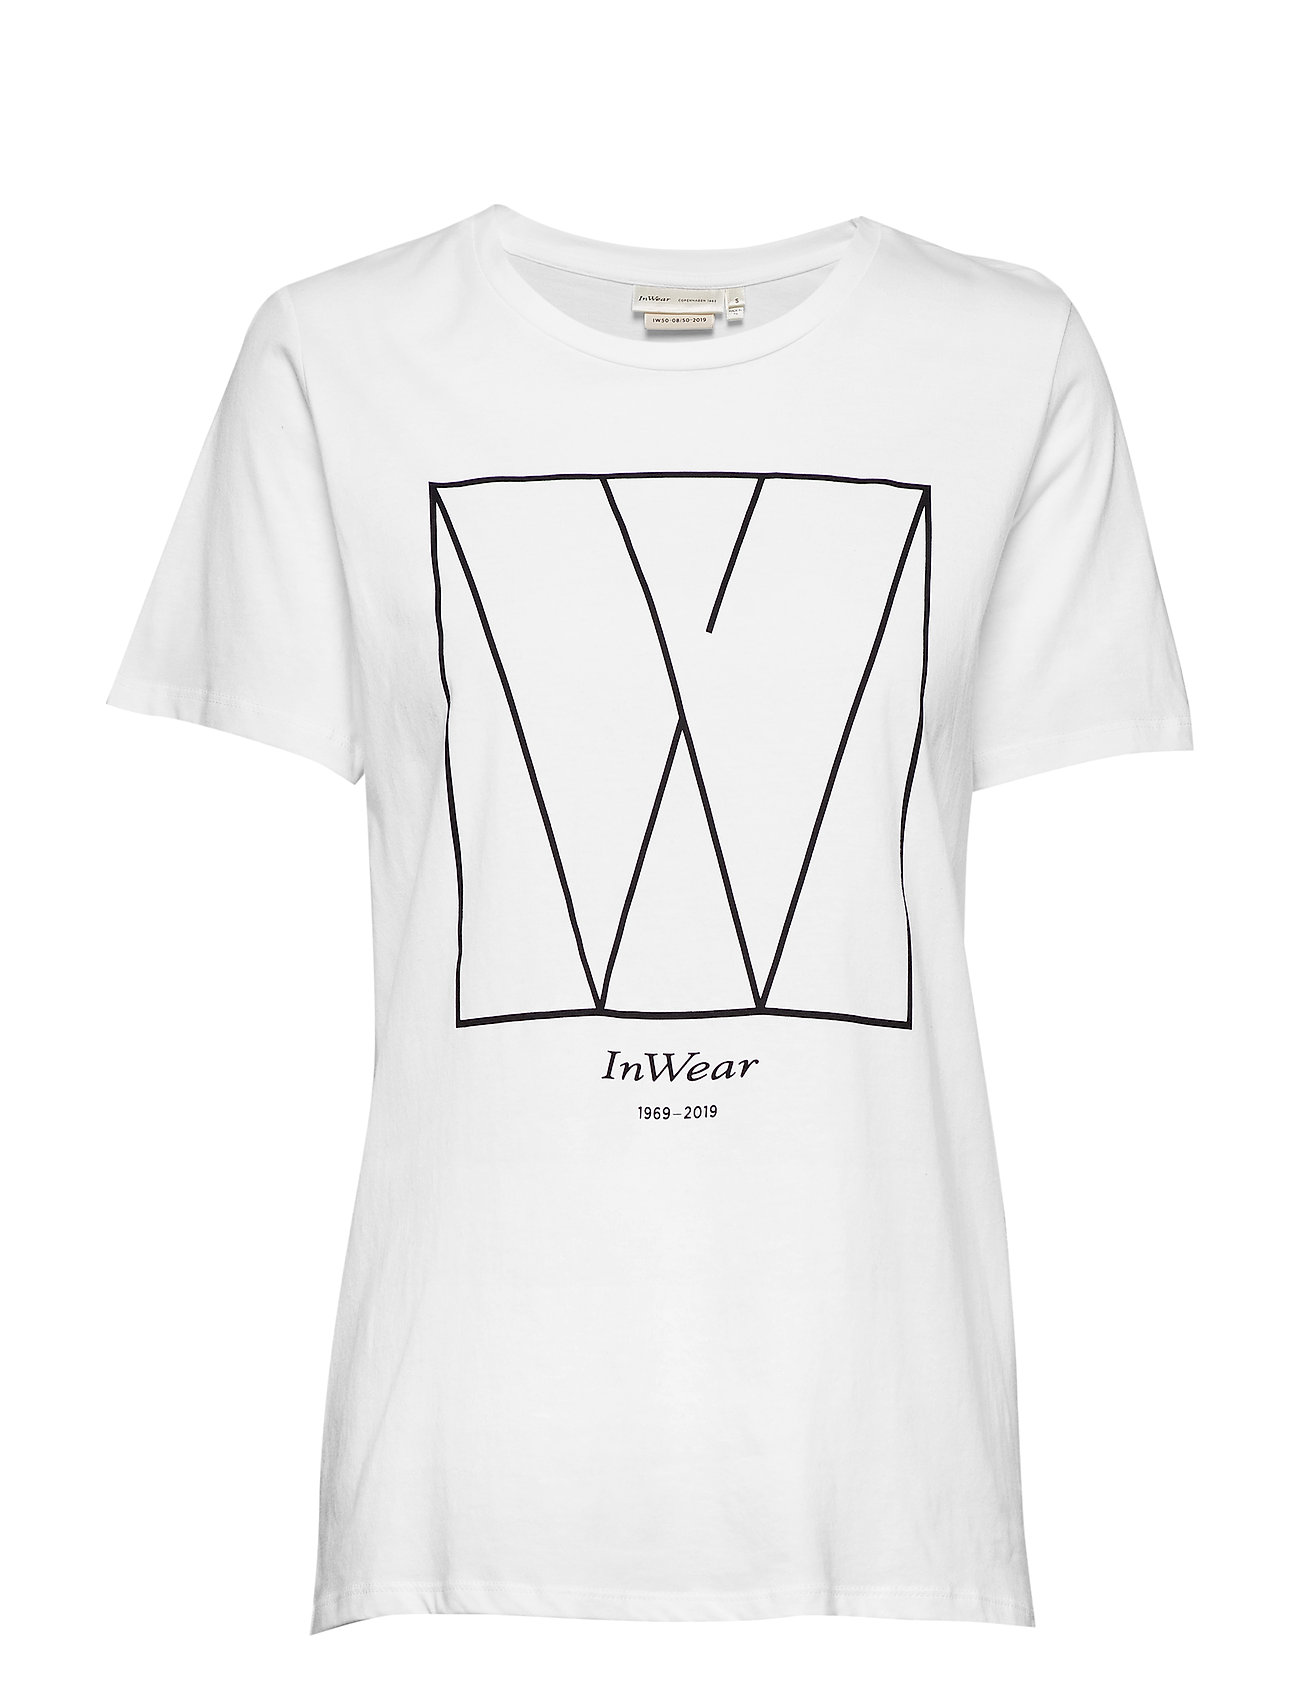 Sera shirtpure Iw50 T WhiteInwear 08 08nOvNwm